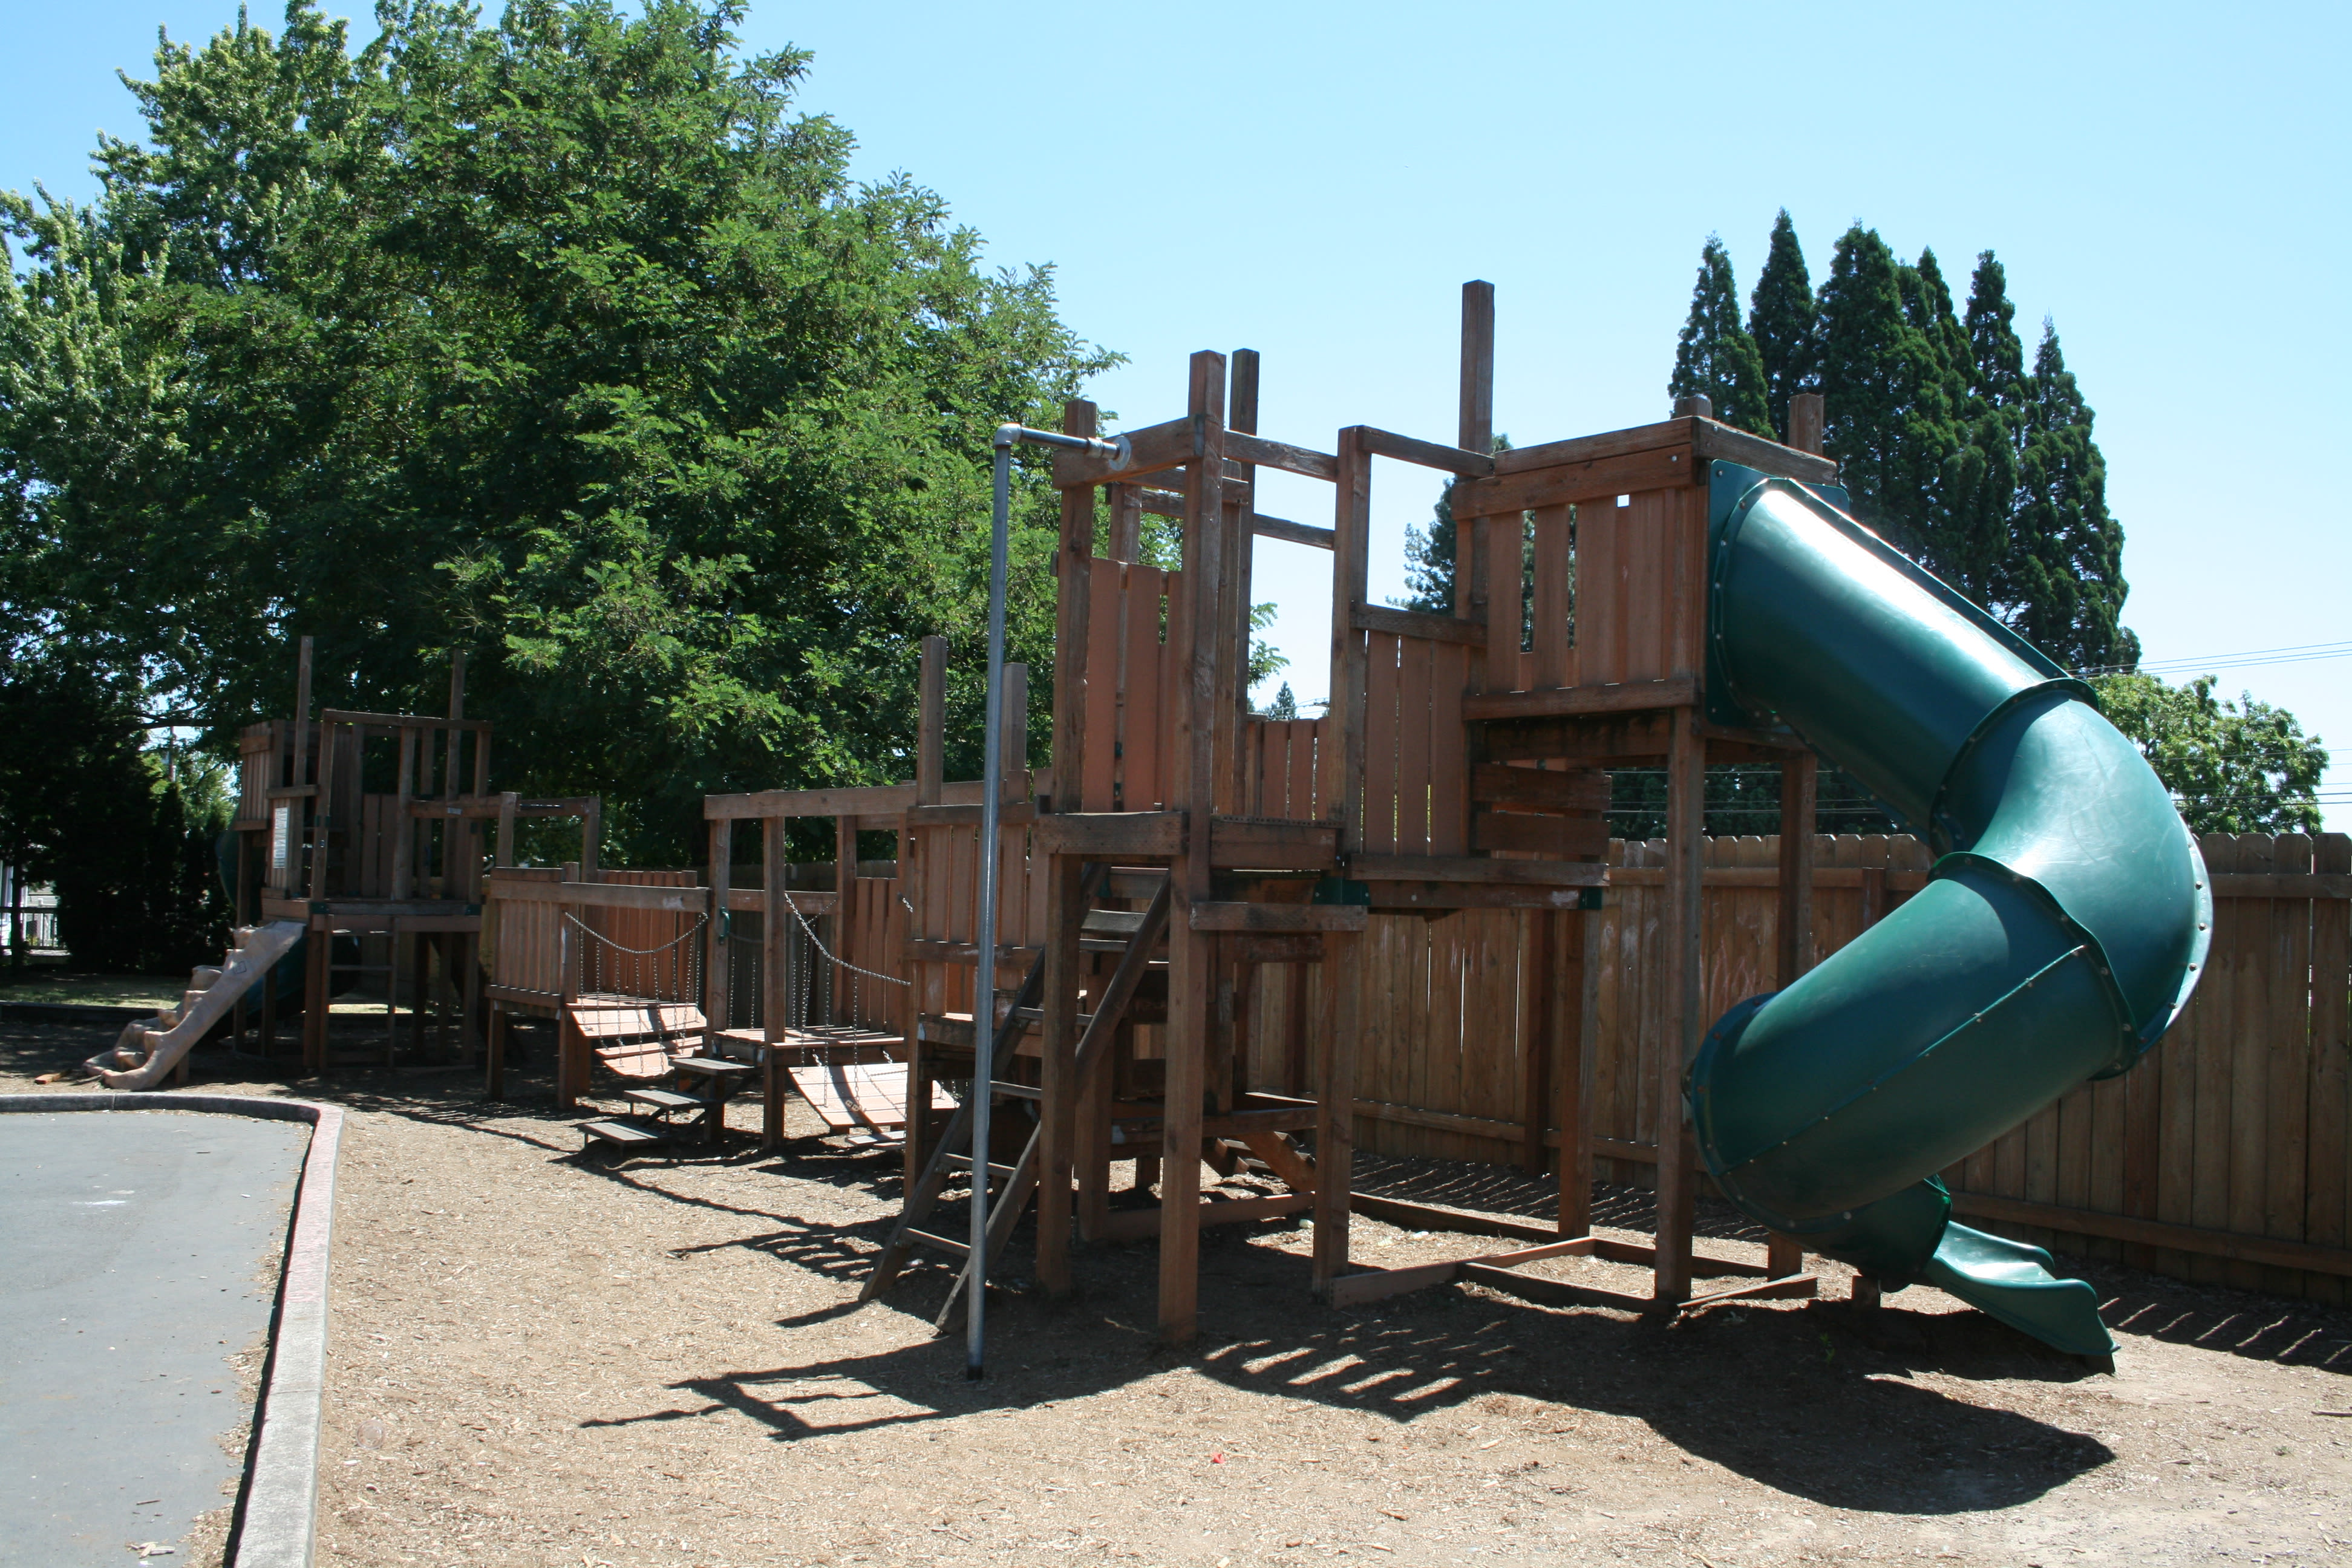 Playground at Cheryl Lynn in Salem, Oregon